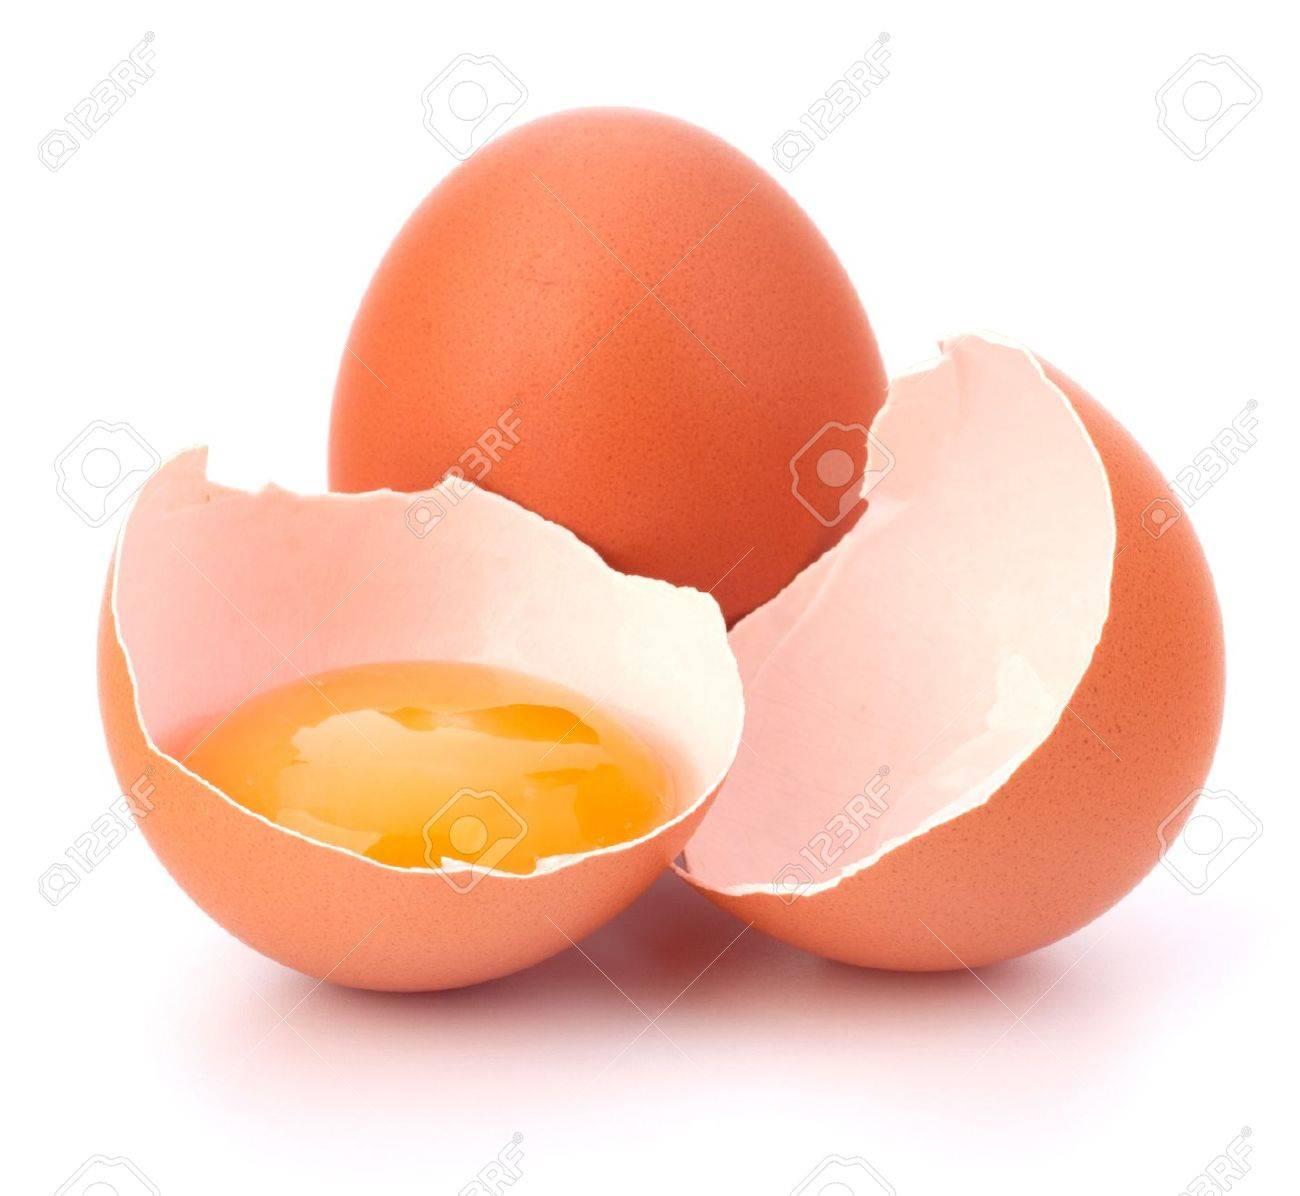 Broken egg isolated on white background Stock Photo - 11447413